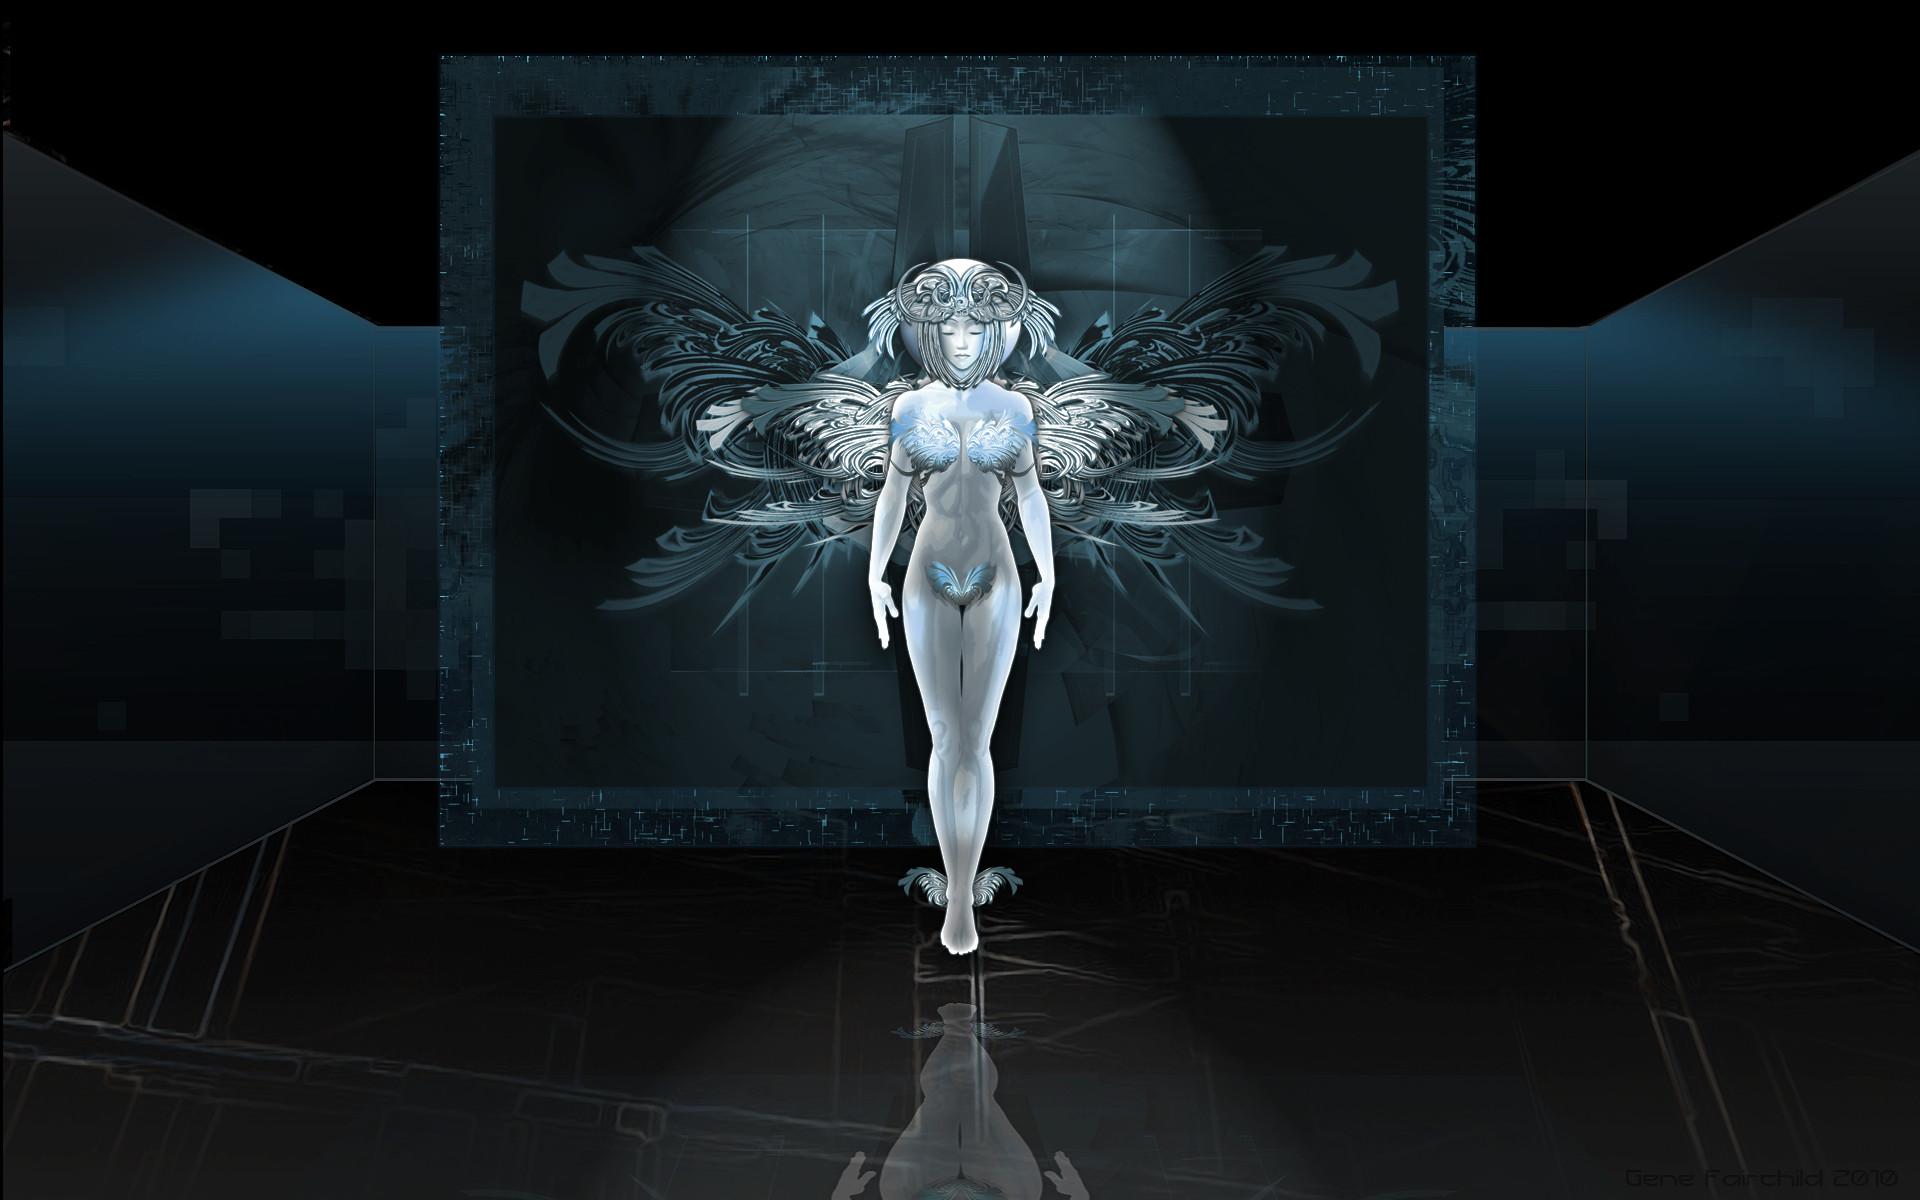 IMAGE(http://fc00.deviantart.net/fs71/f/2010/030/f/5/Goddess_Perspectives_by_lightbender.jpg)